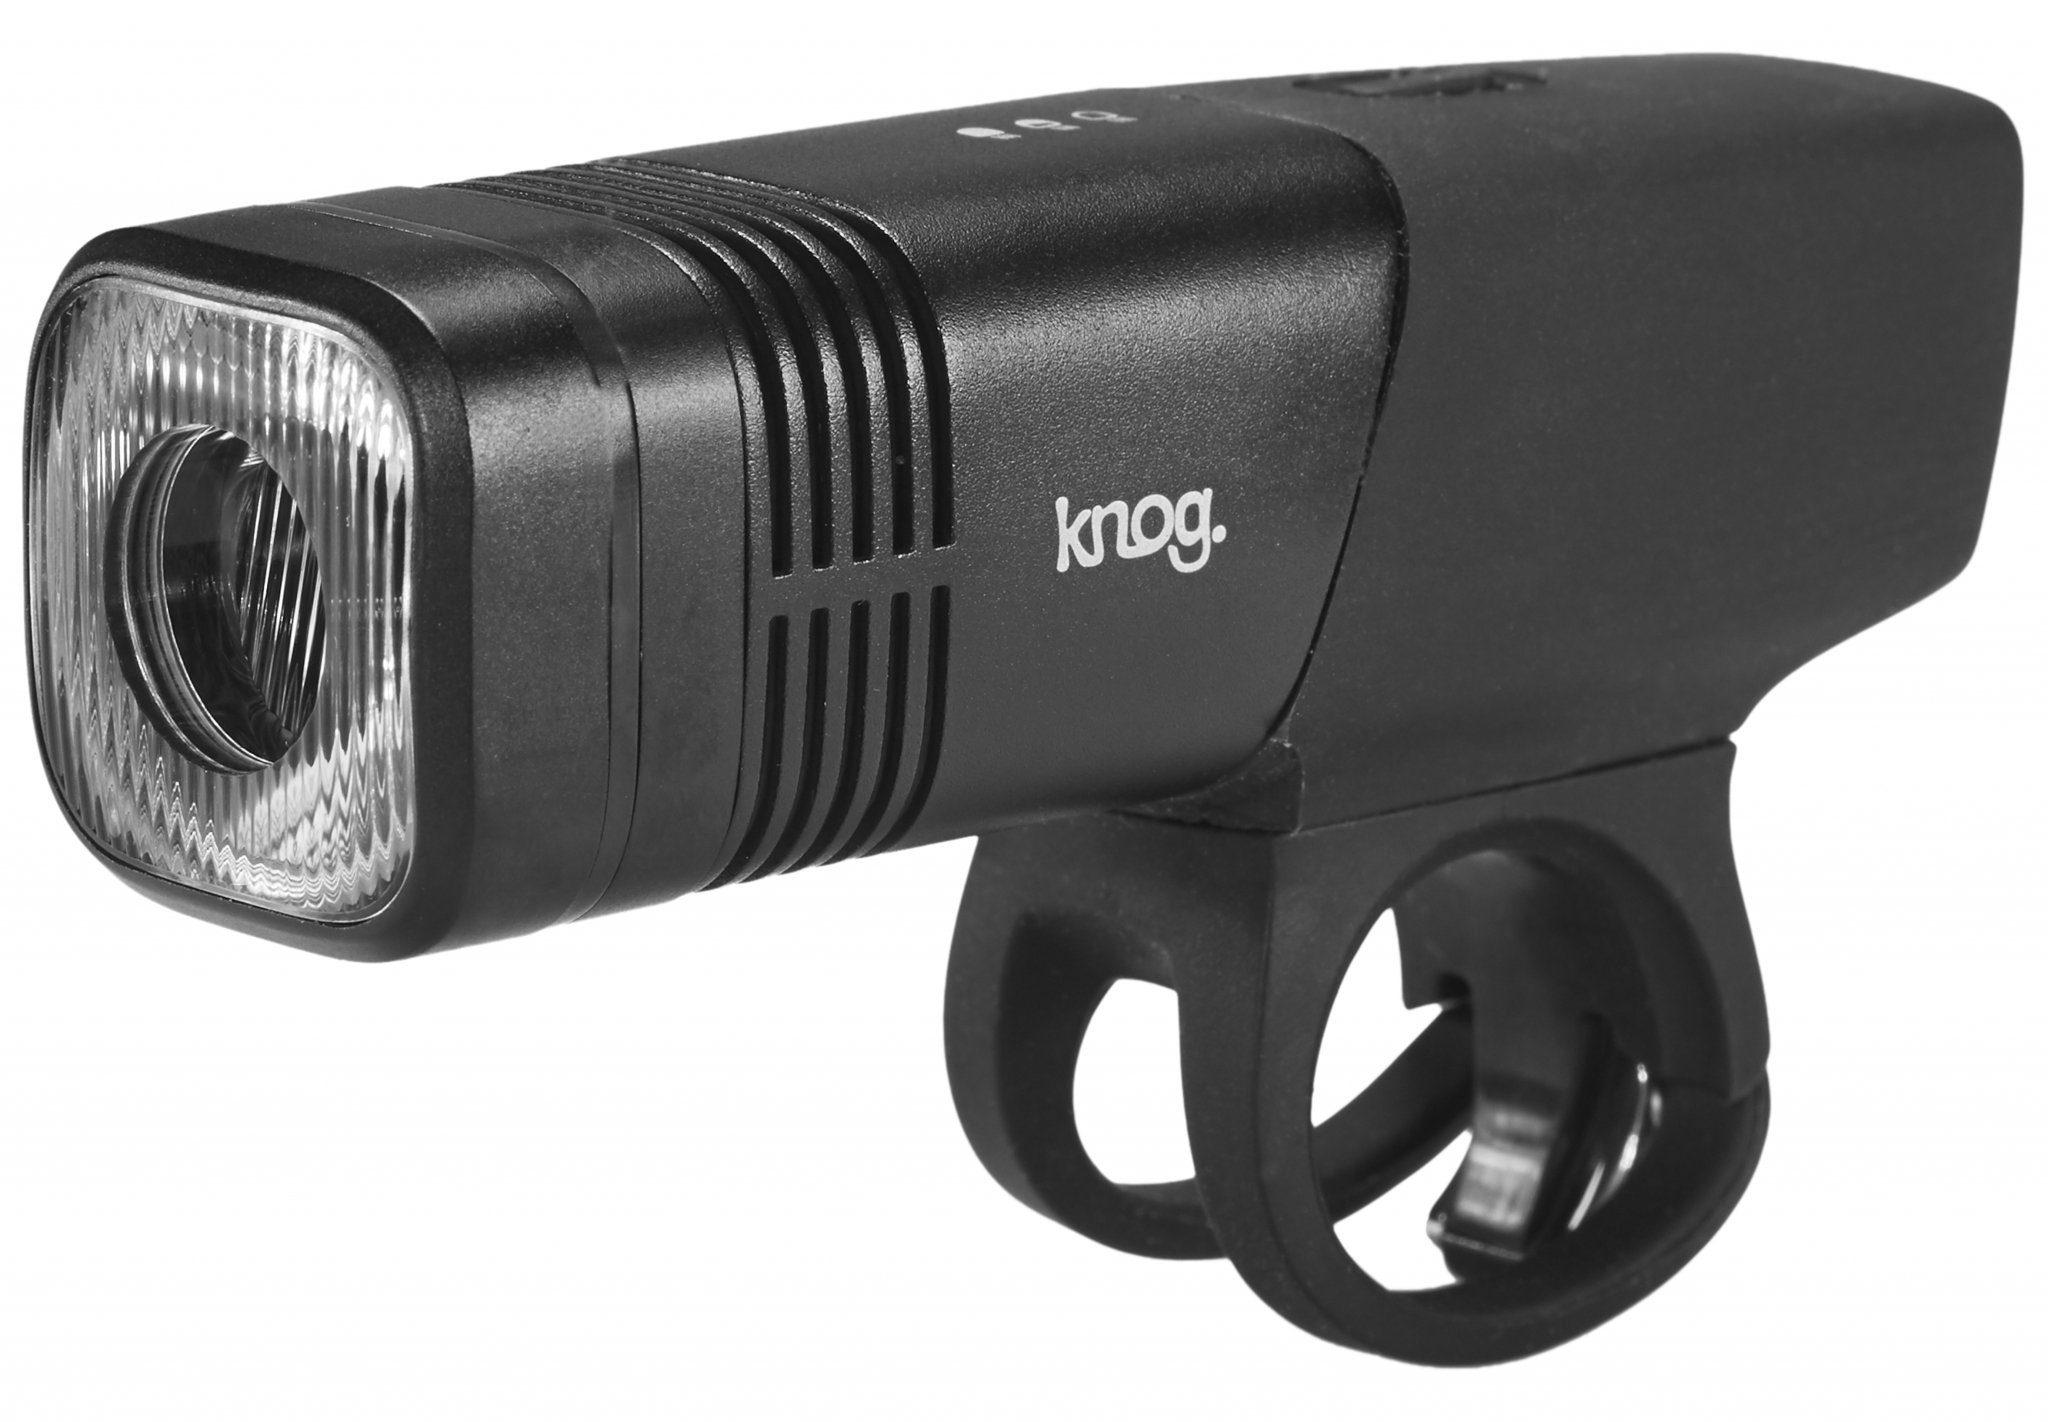 Knog Fahrradbeleuchtung »Knog Blinder Beam 300 Frontlicht StVZO weiße LED«